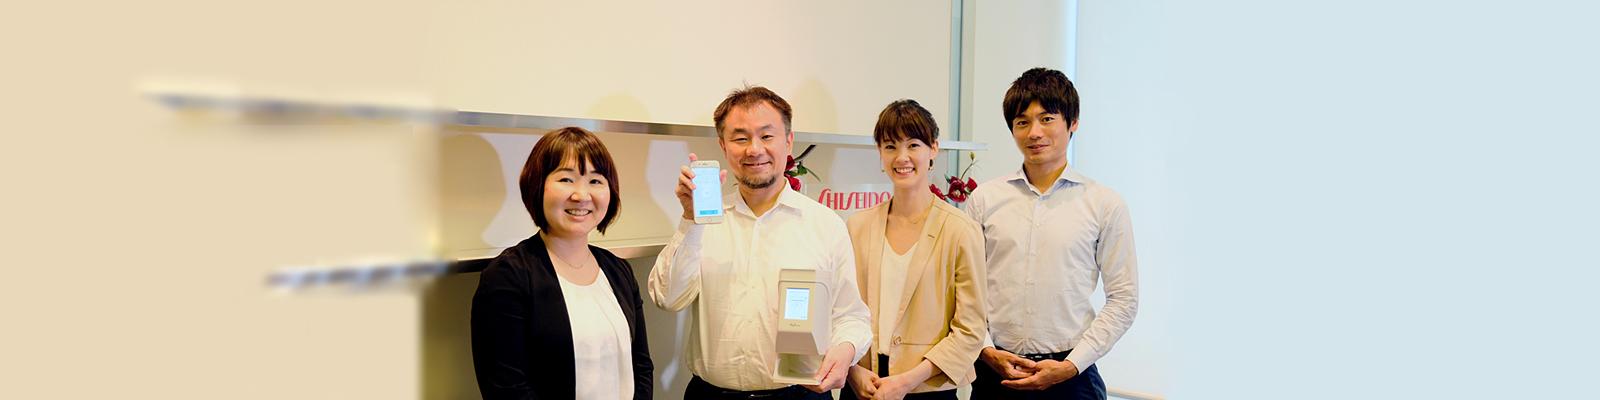 Shiseido Japan × NRI Combining Cutting-Edge Skin Science and